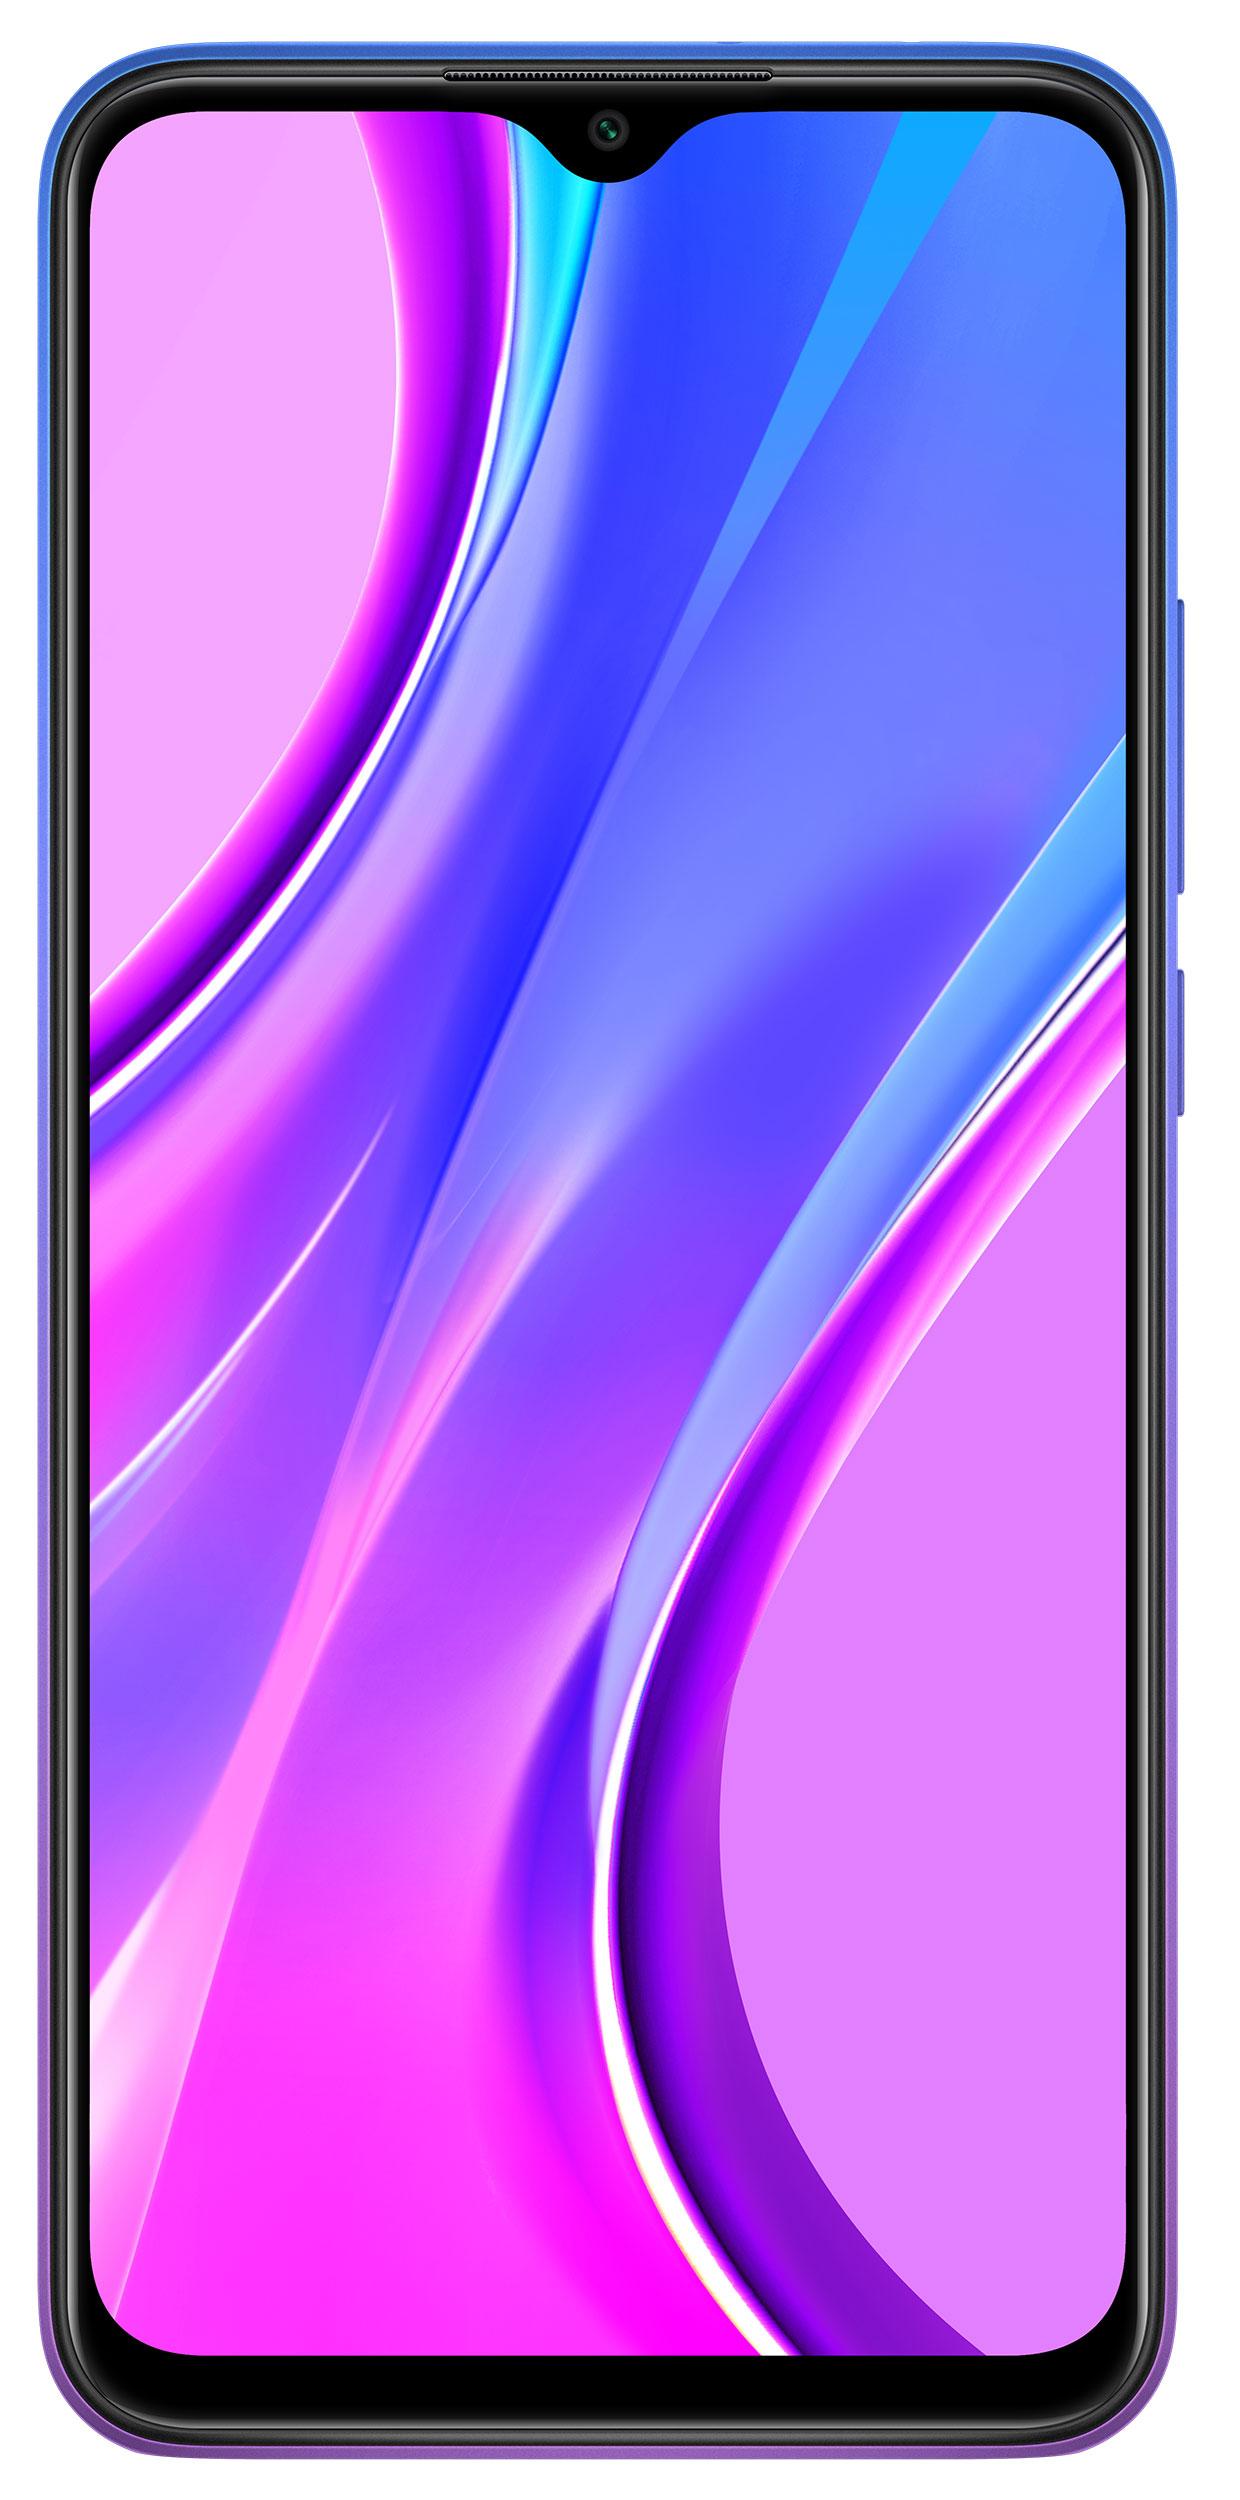 Smartphone Redmi 9 - Global - 3+32GB - Violet